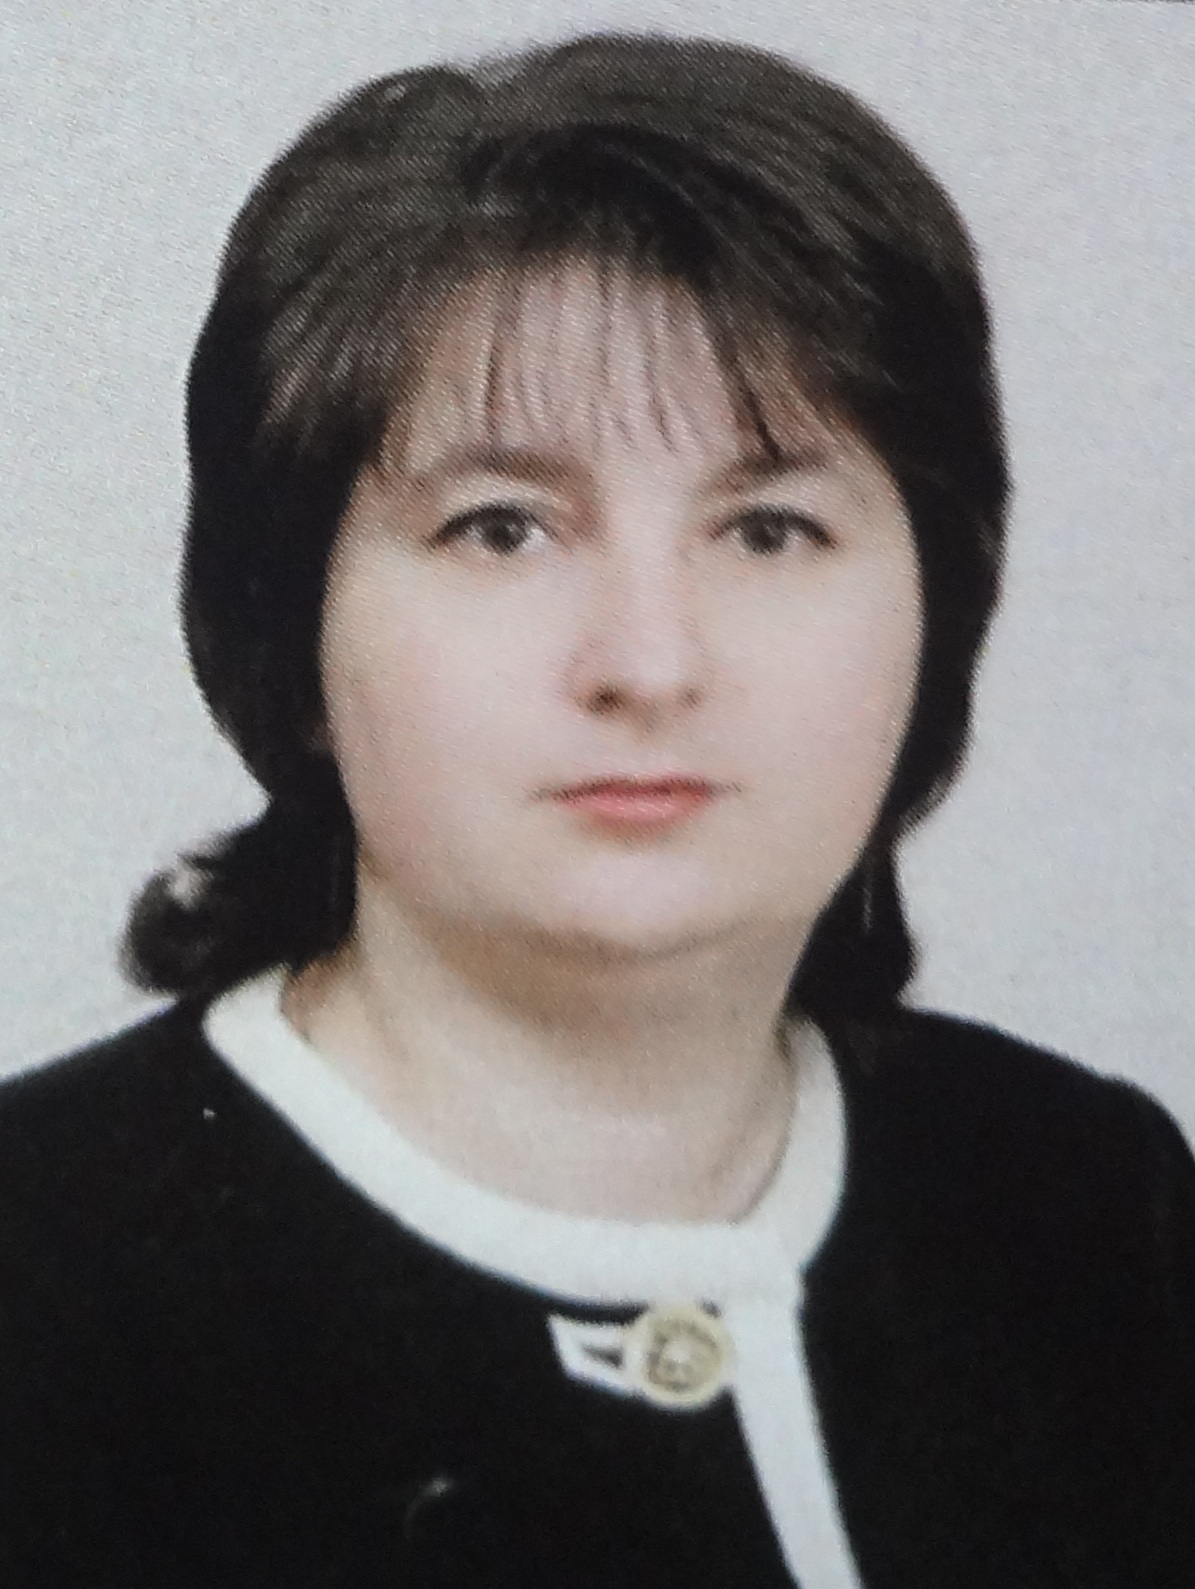 rjabchenko